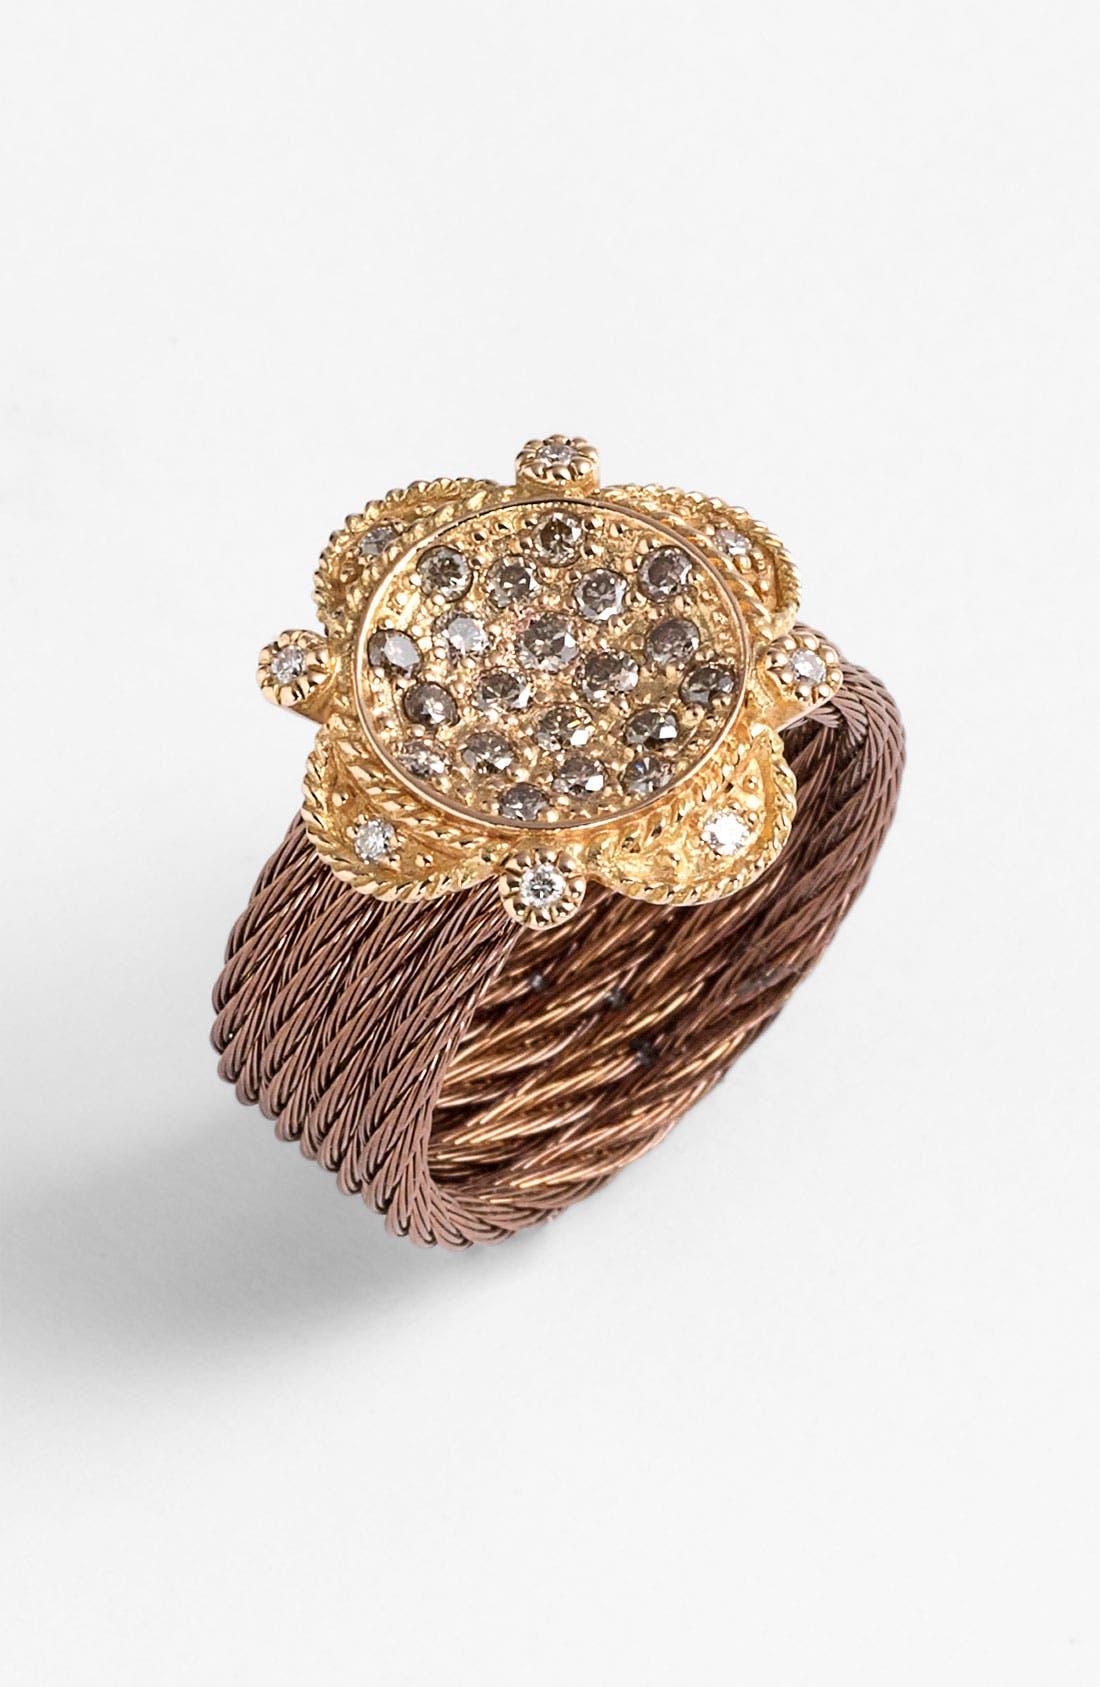 Alternate Image 1 Selected - ALOR® Champagne Diamond Ring